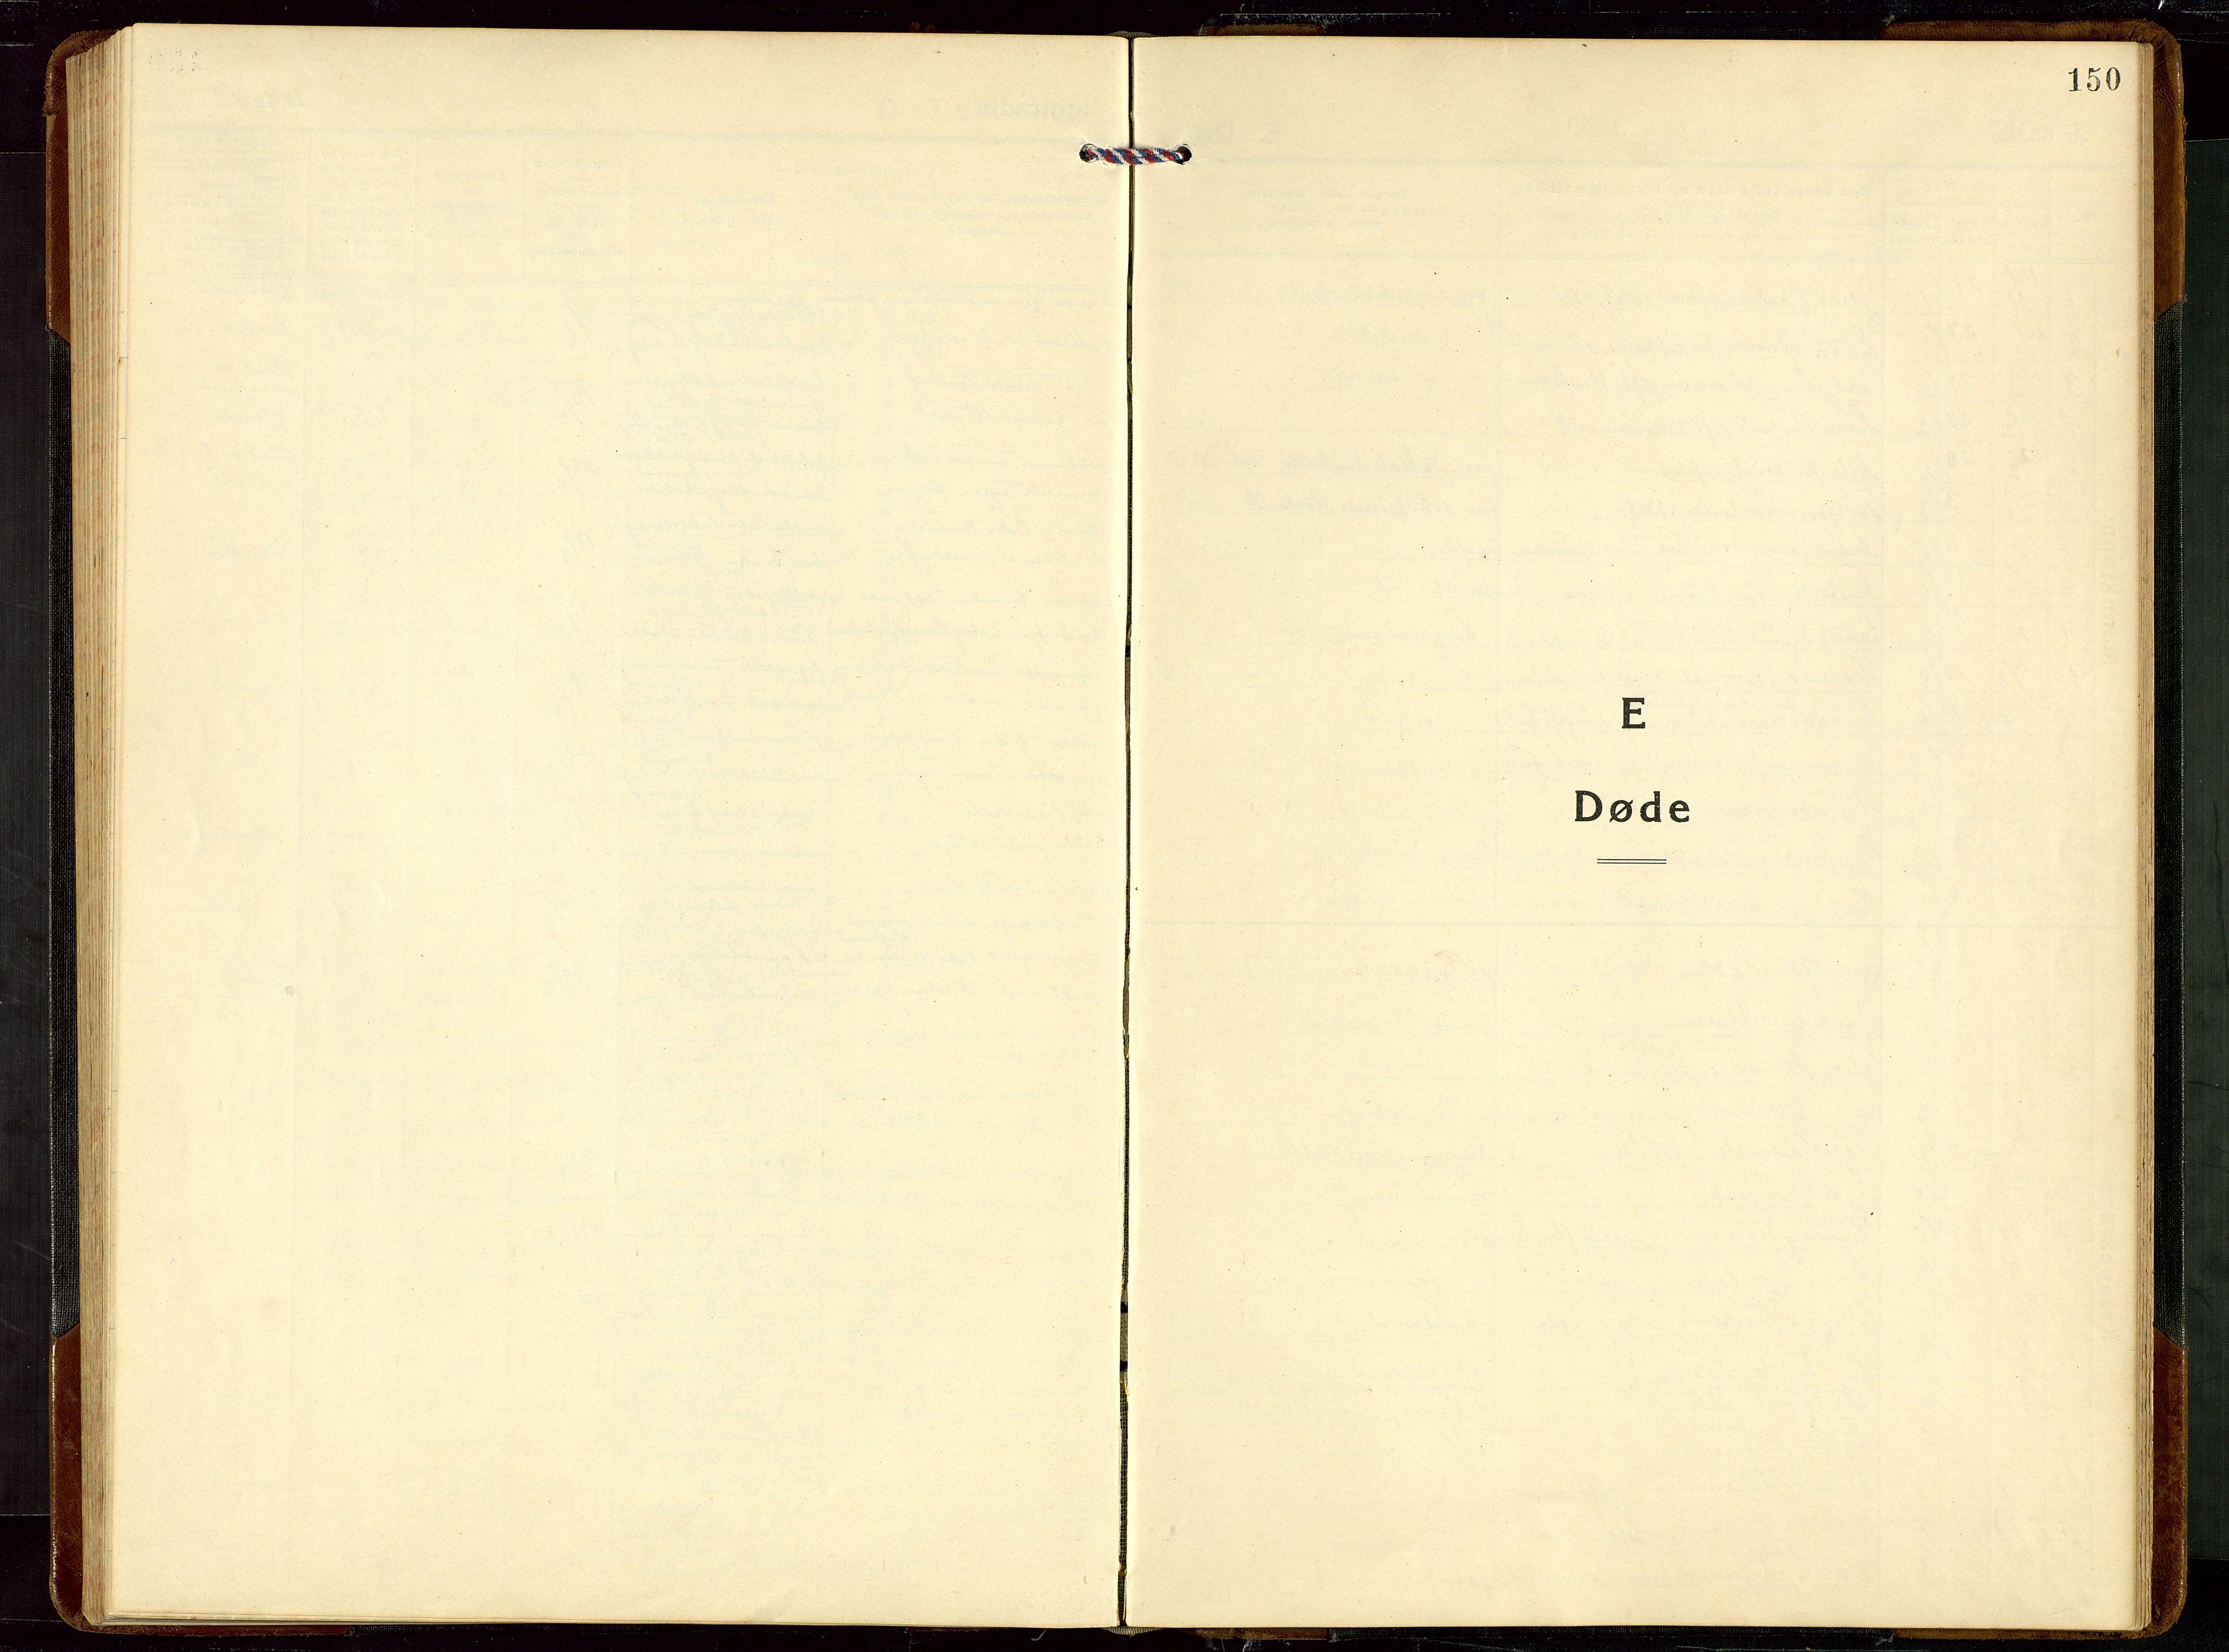 SAST, Egersund sokneprestkontor, Klokkerbok nr. B 14, 1931-1949, s. 150